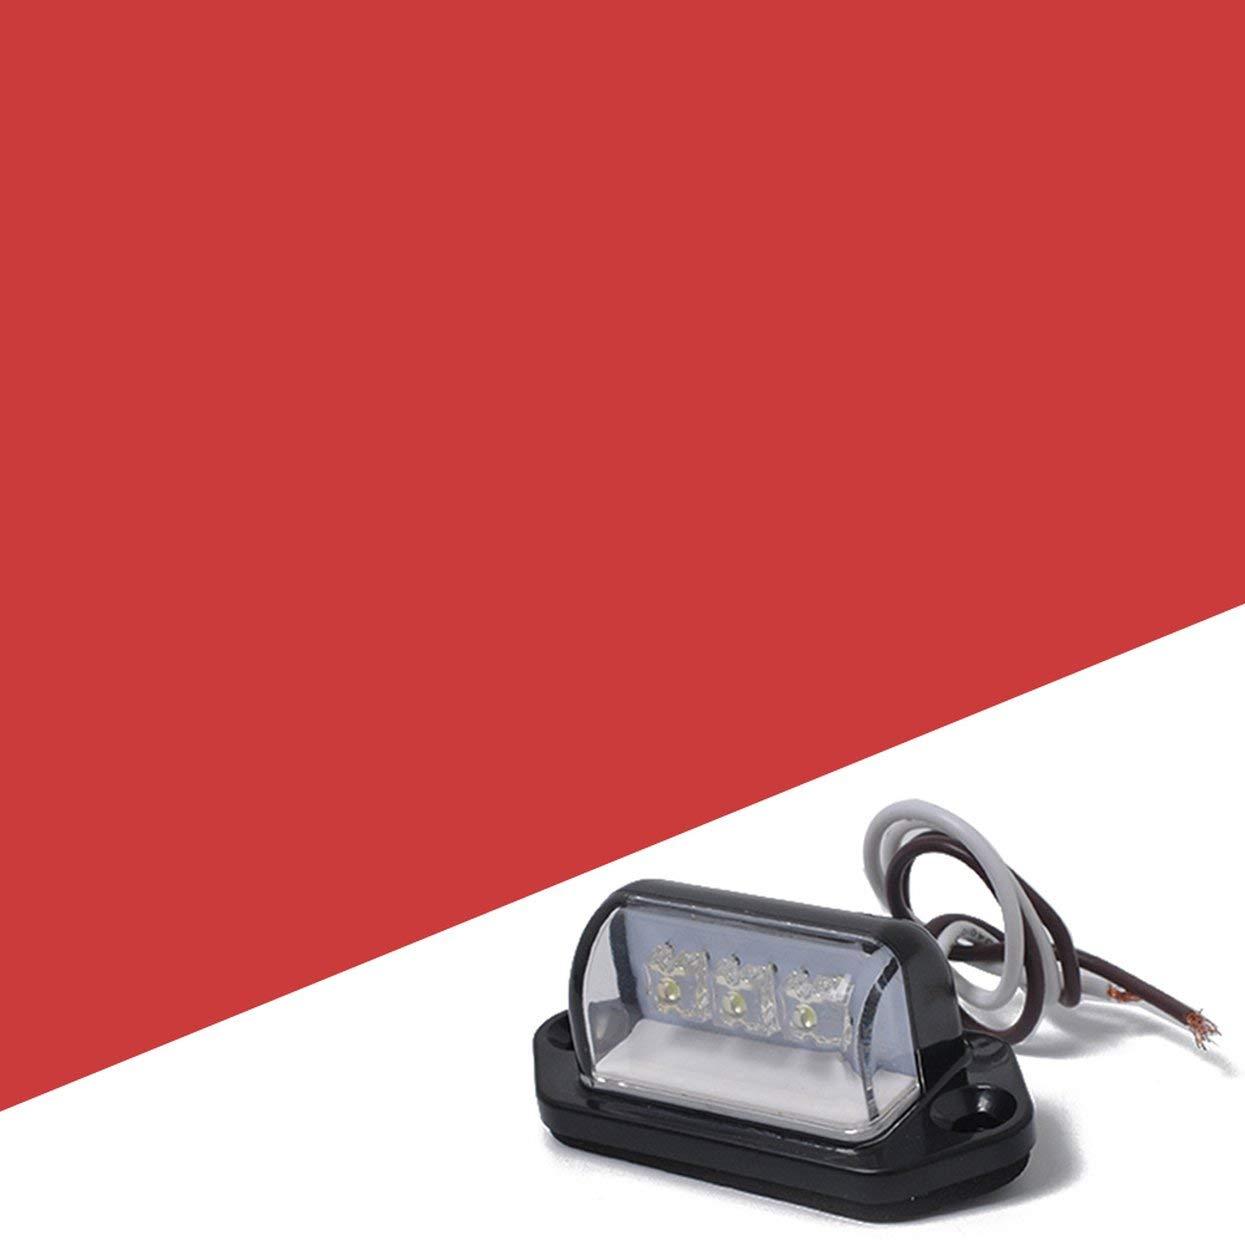 Tree-on-Life La Plaque min/éralogique de LED Allume Les lumi/ères LED Super Lumineuses pour la lumi/ère de permis dautomobiles de Motos de remorques de Camion